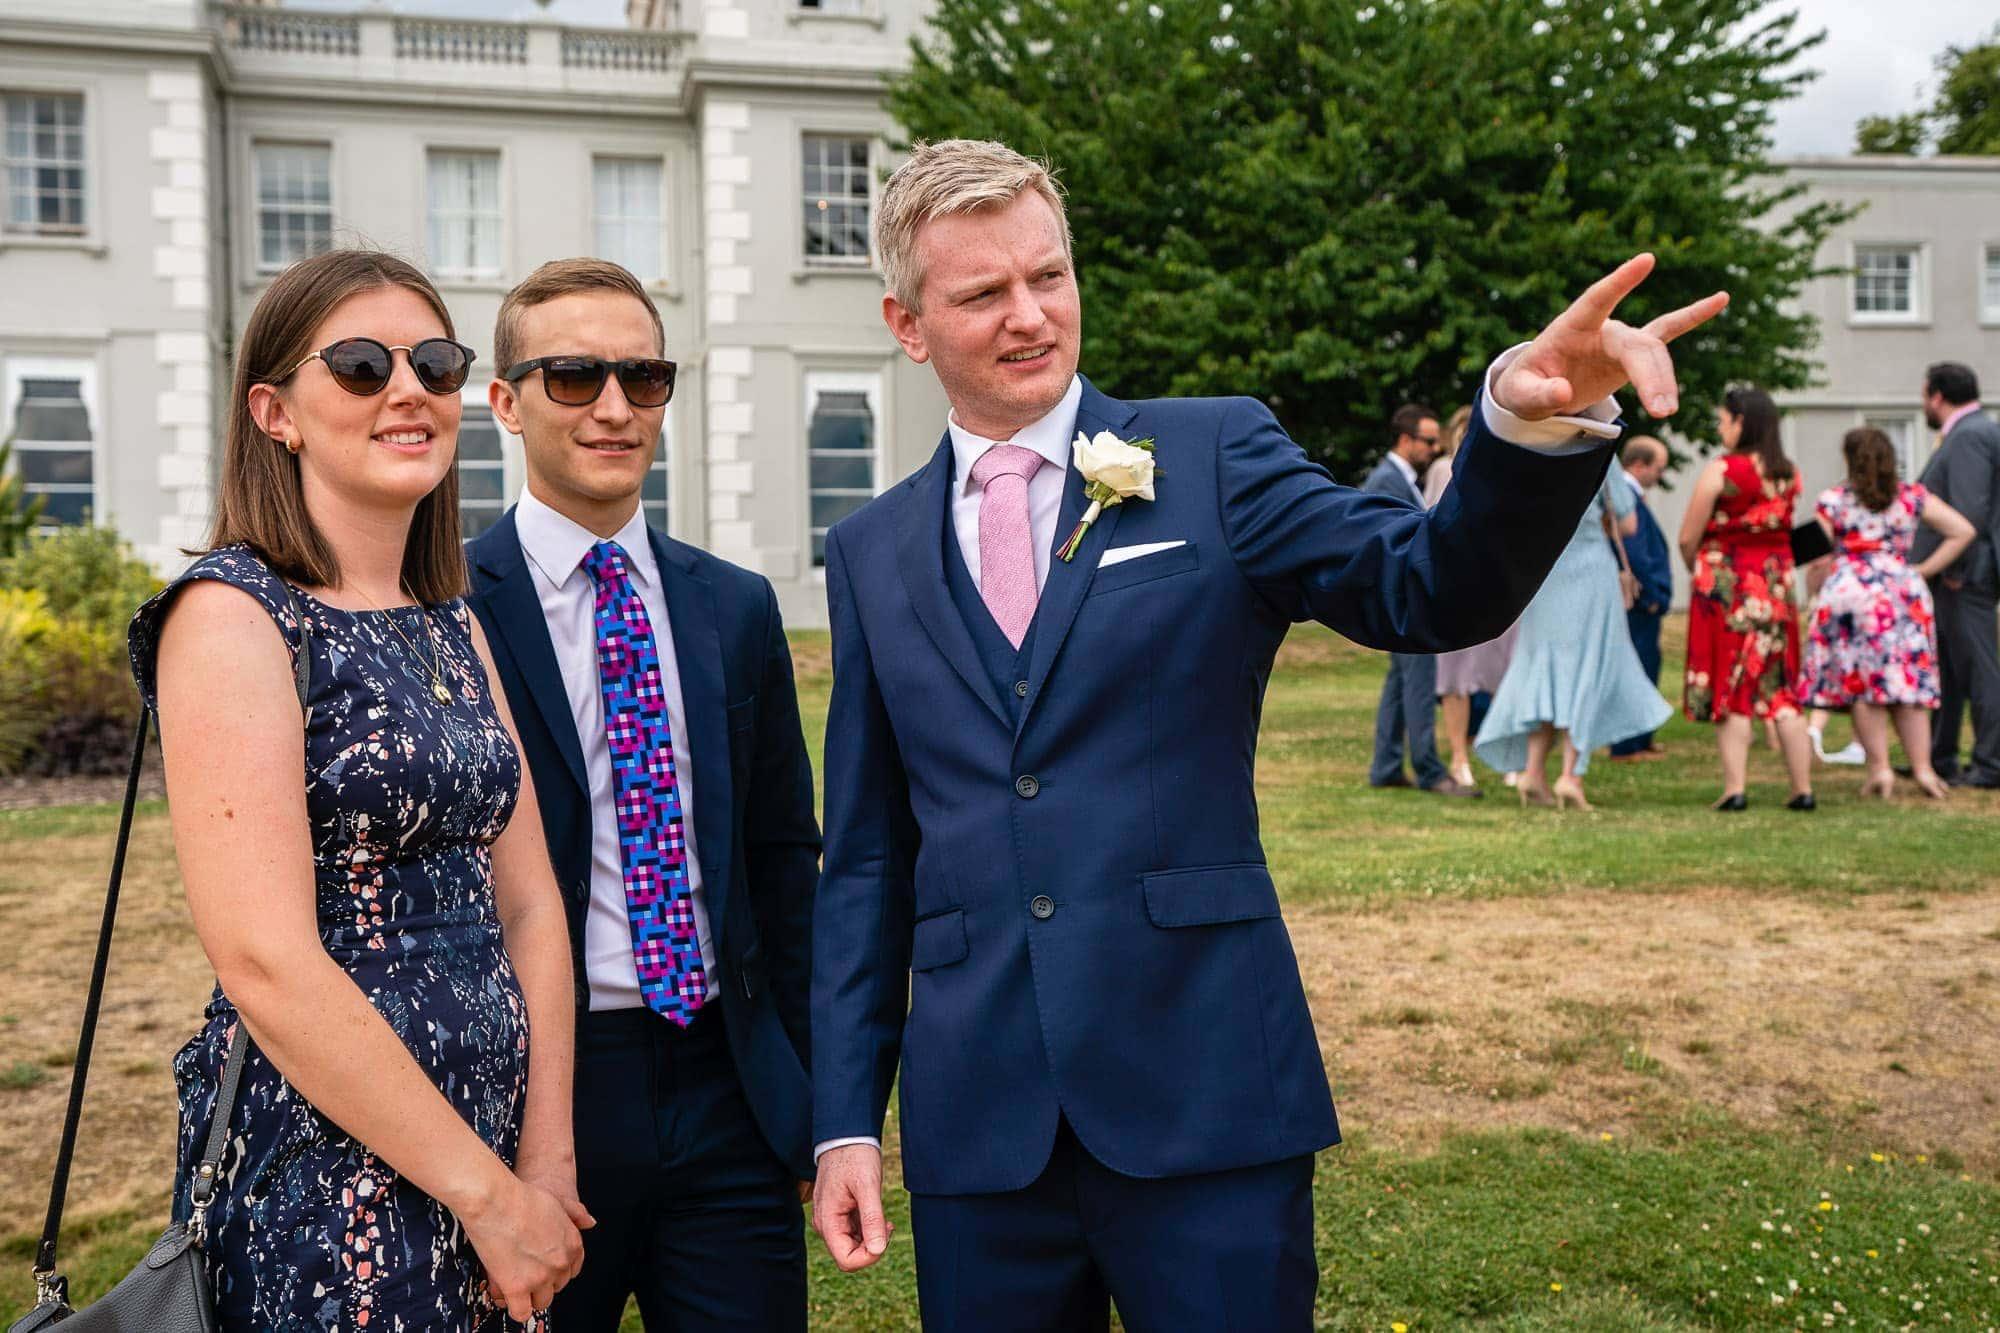 Wokefield Estate Wedding 20 3494